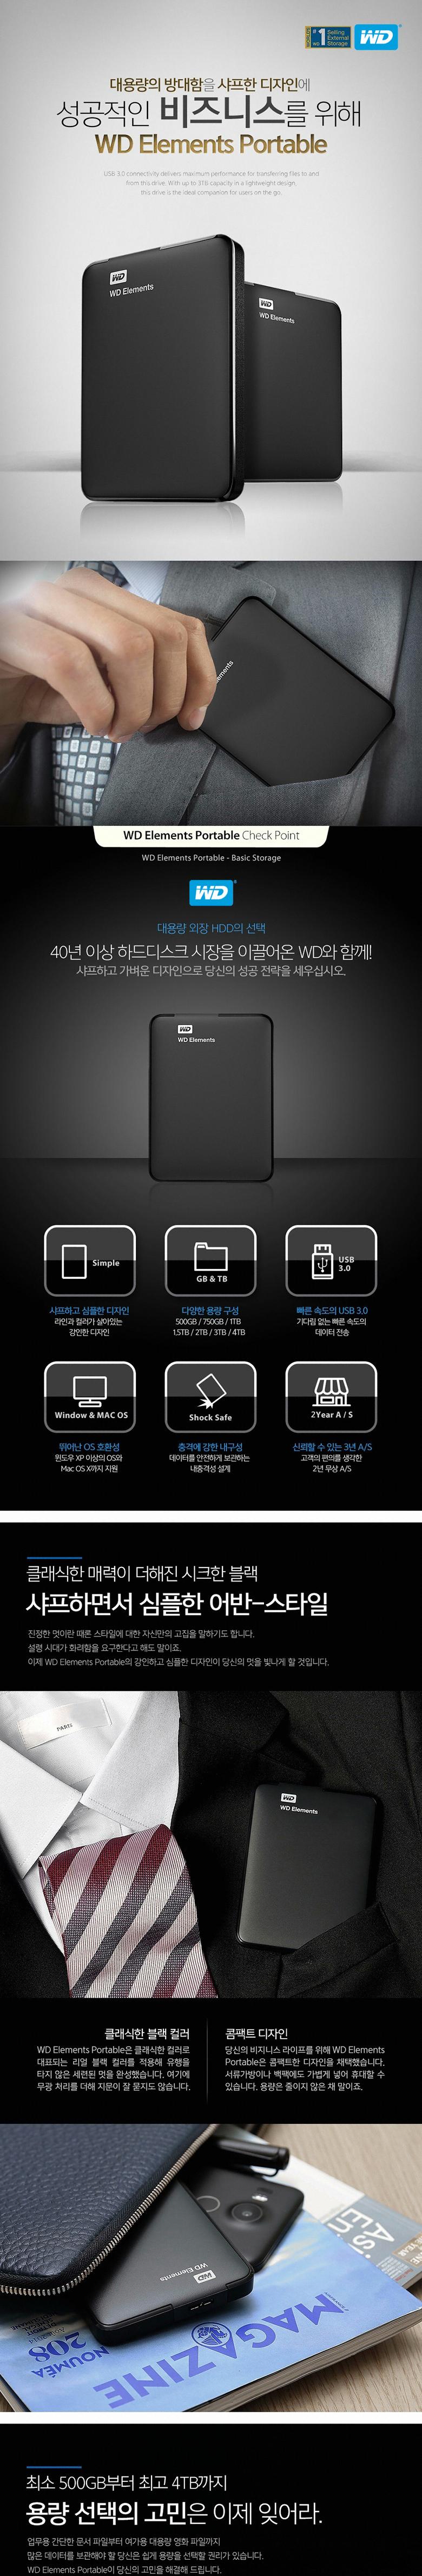 WD_Elements_Portable_01.jpg